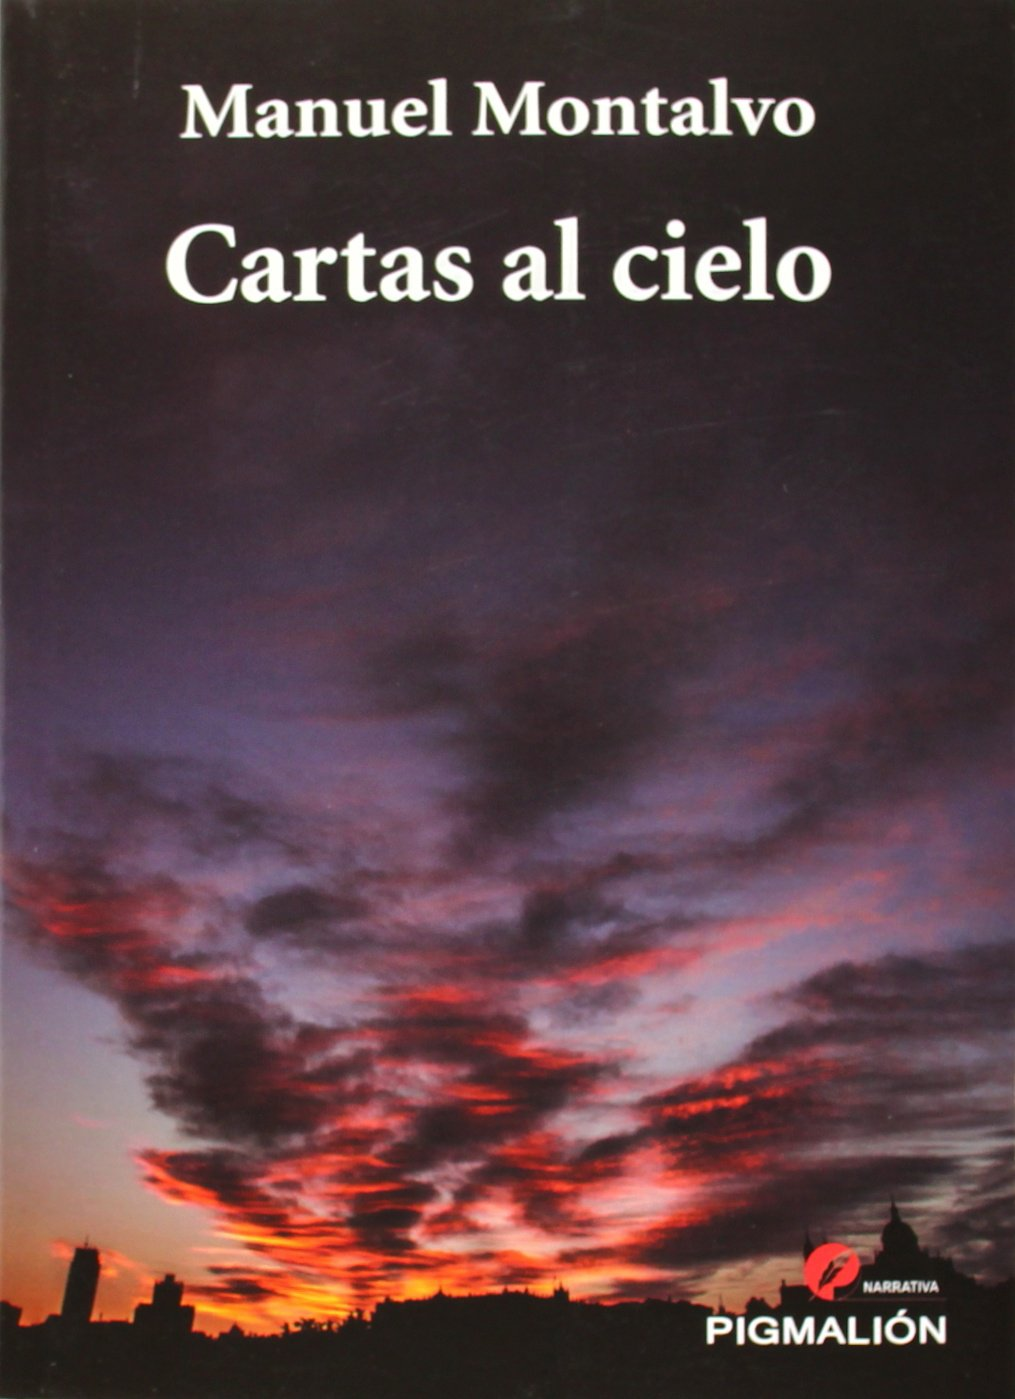 Cartas al cielo (Pigmalión narrativa) Tapa blanda – 27 sep 2014 Manuel Montalvo 8415916647 Diaries letters & journals